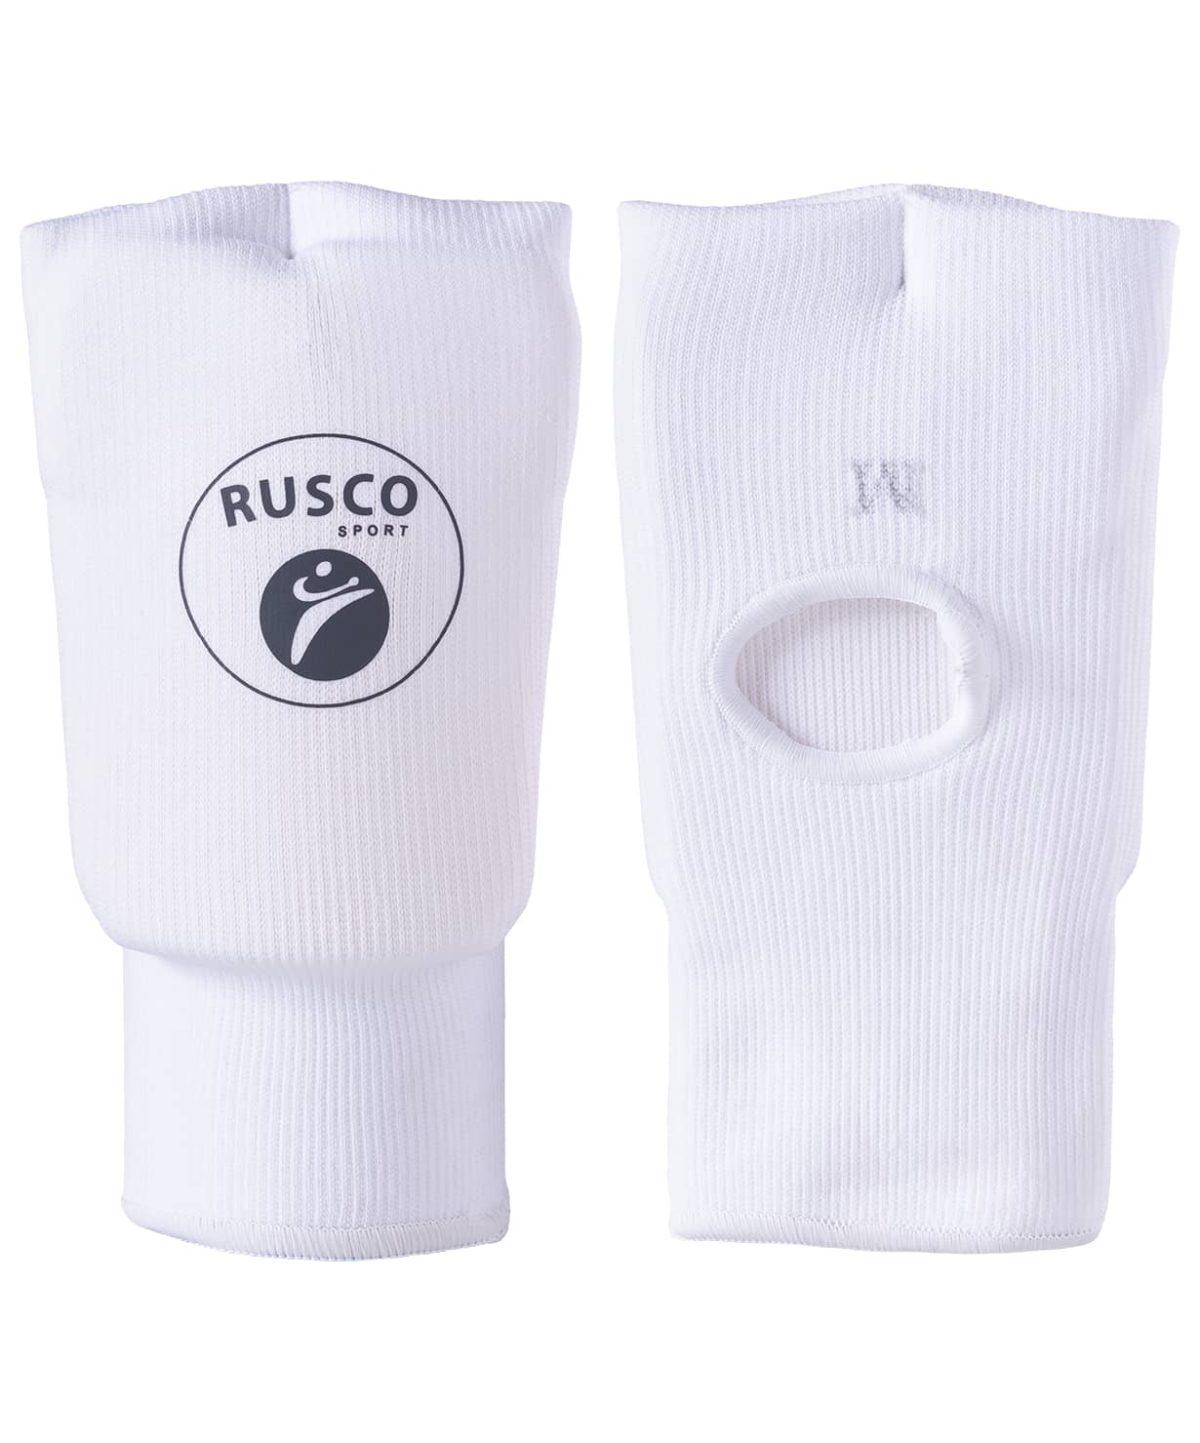 RUSCO Накладки на кисть  1281: белый - 1